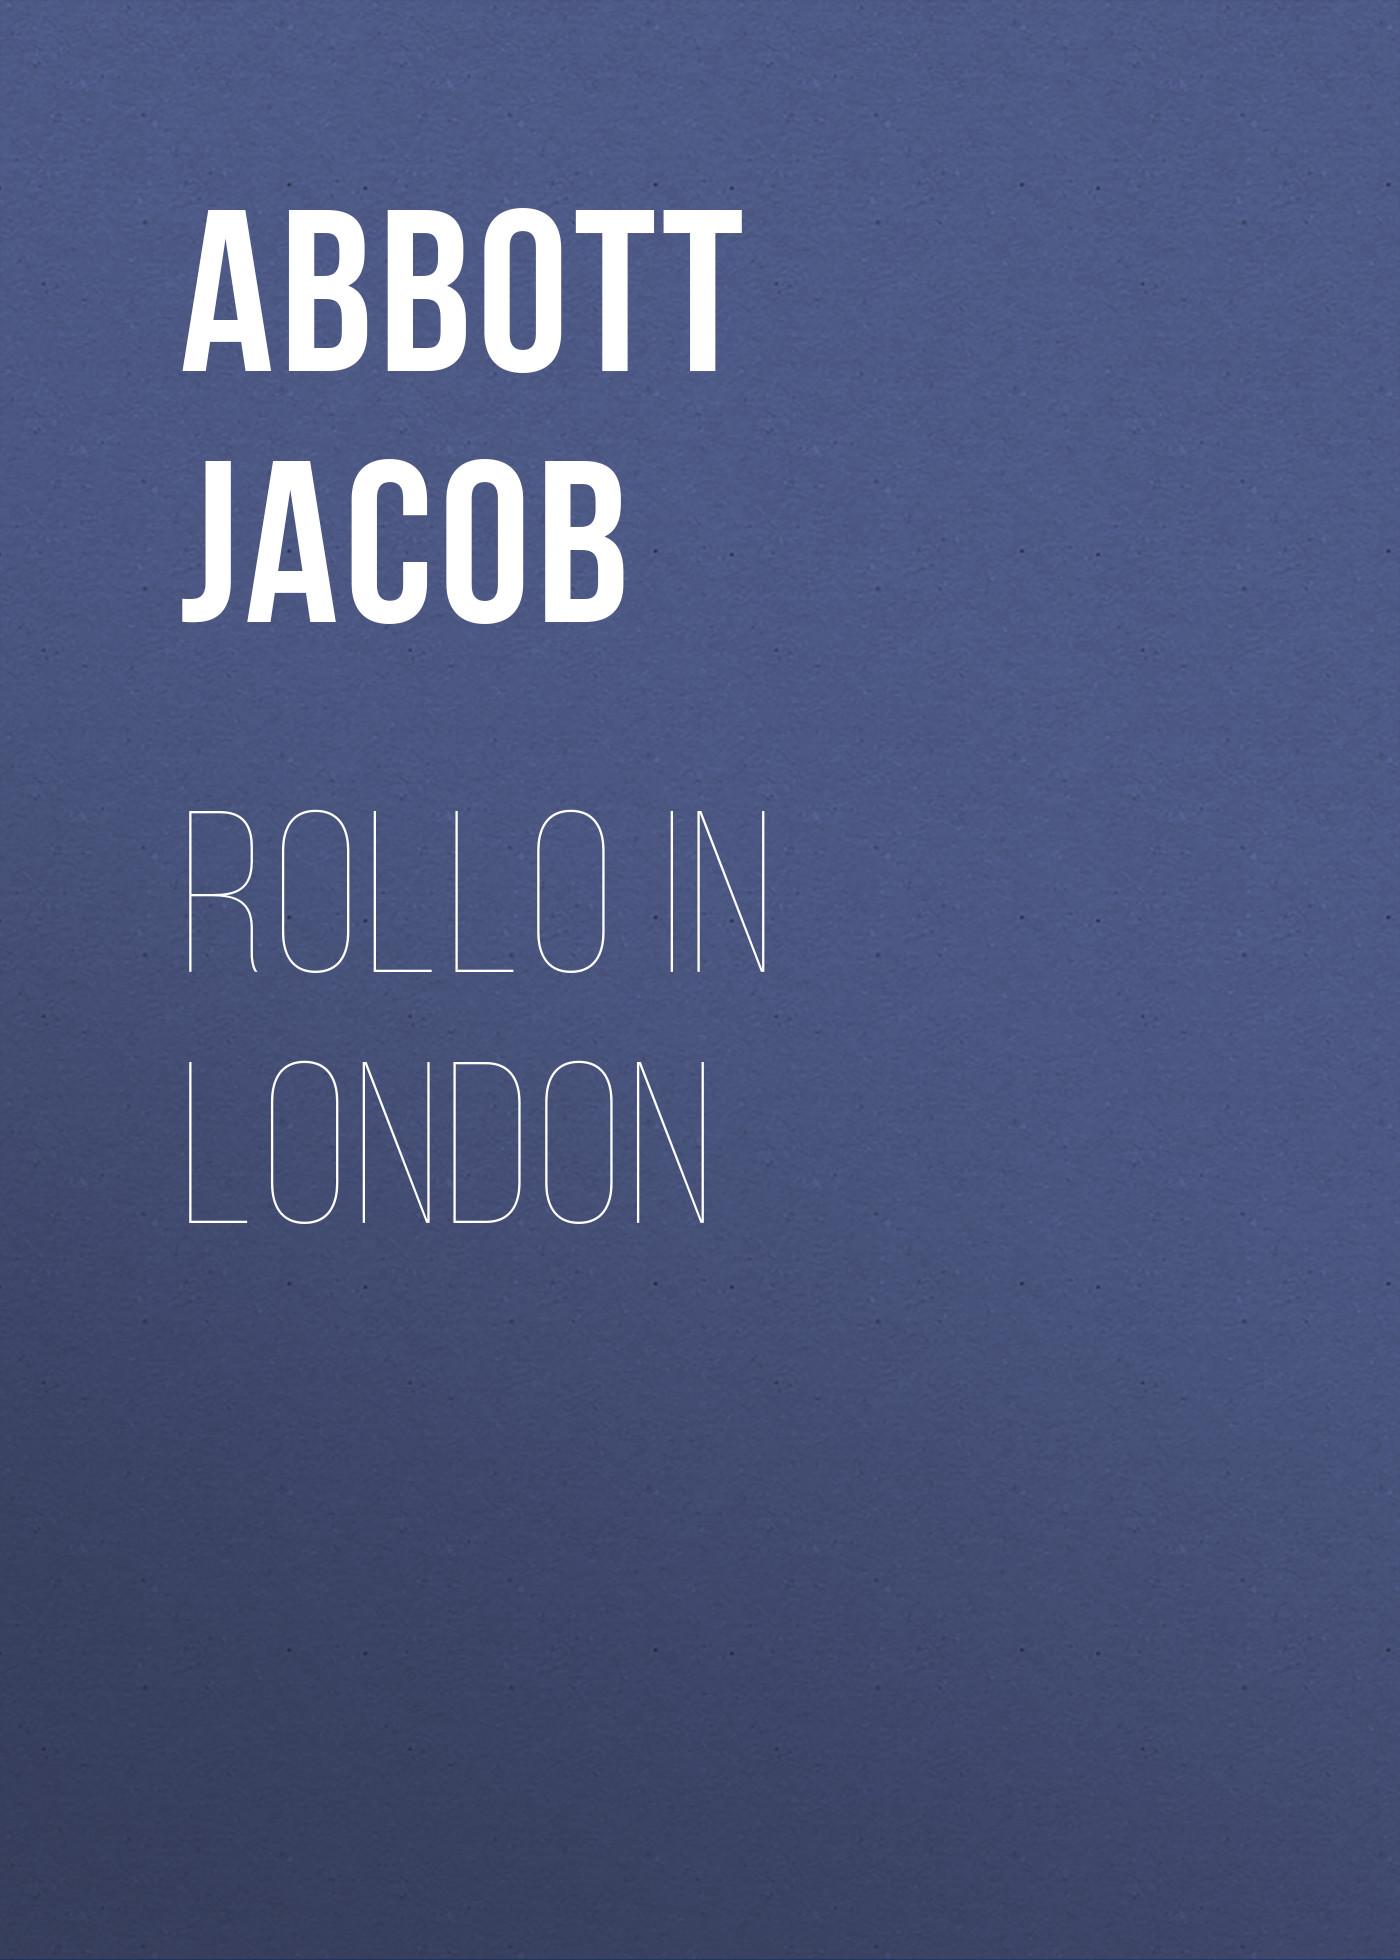 Abbott Jacob Rollo in London abbott jacob rollo on the rhine